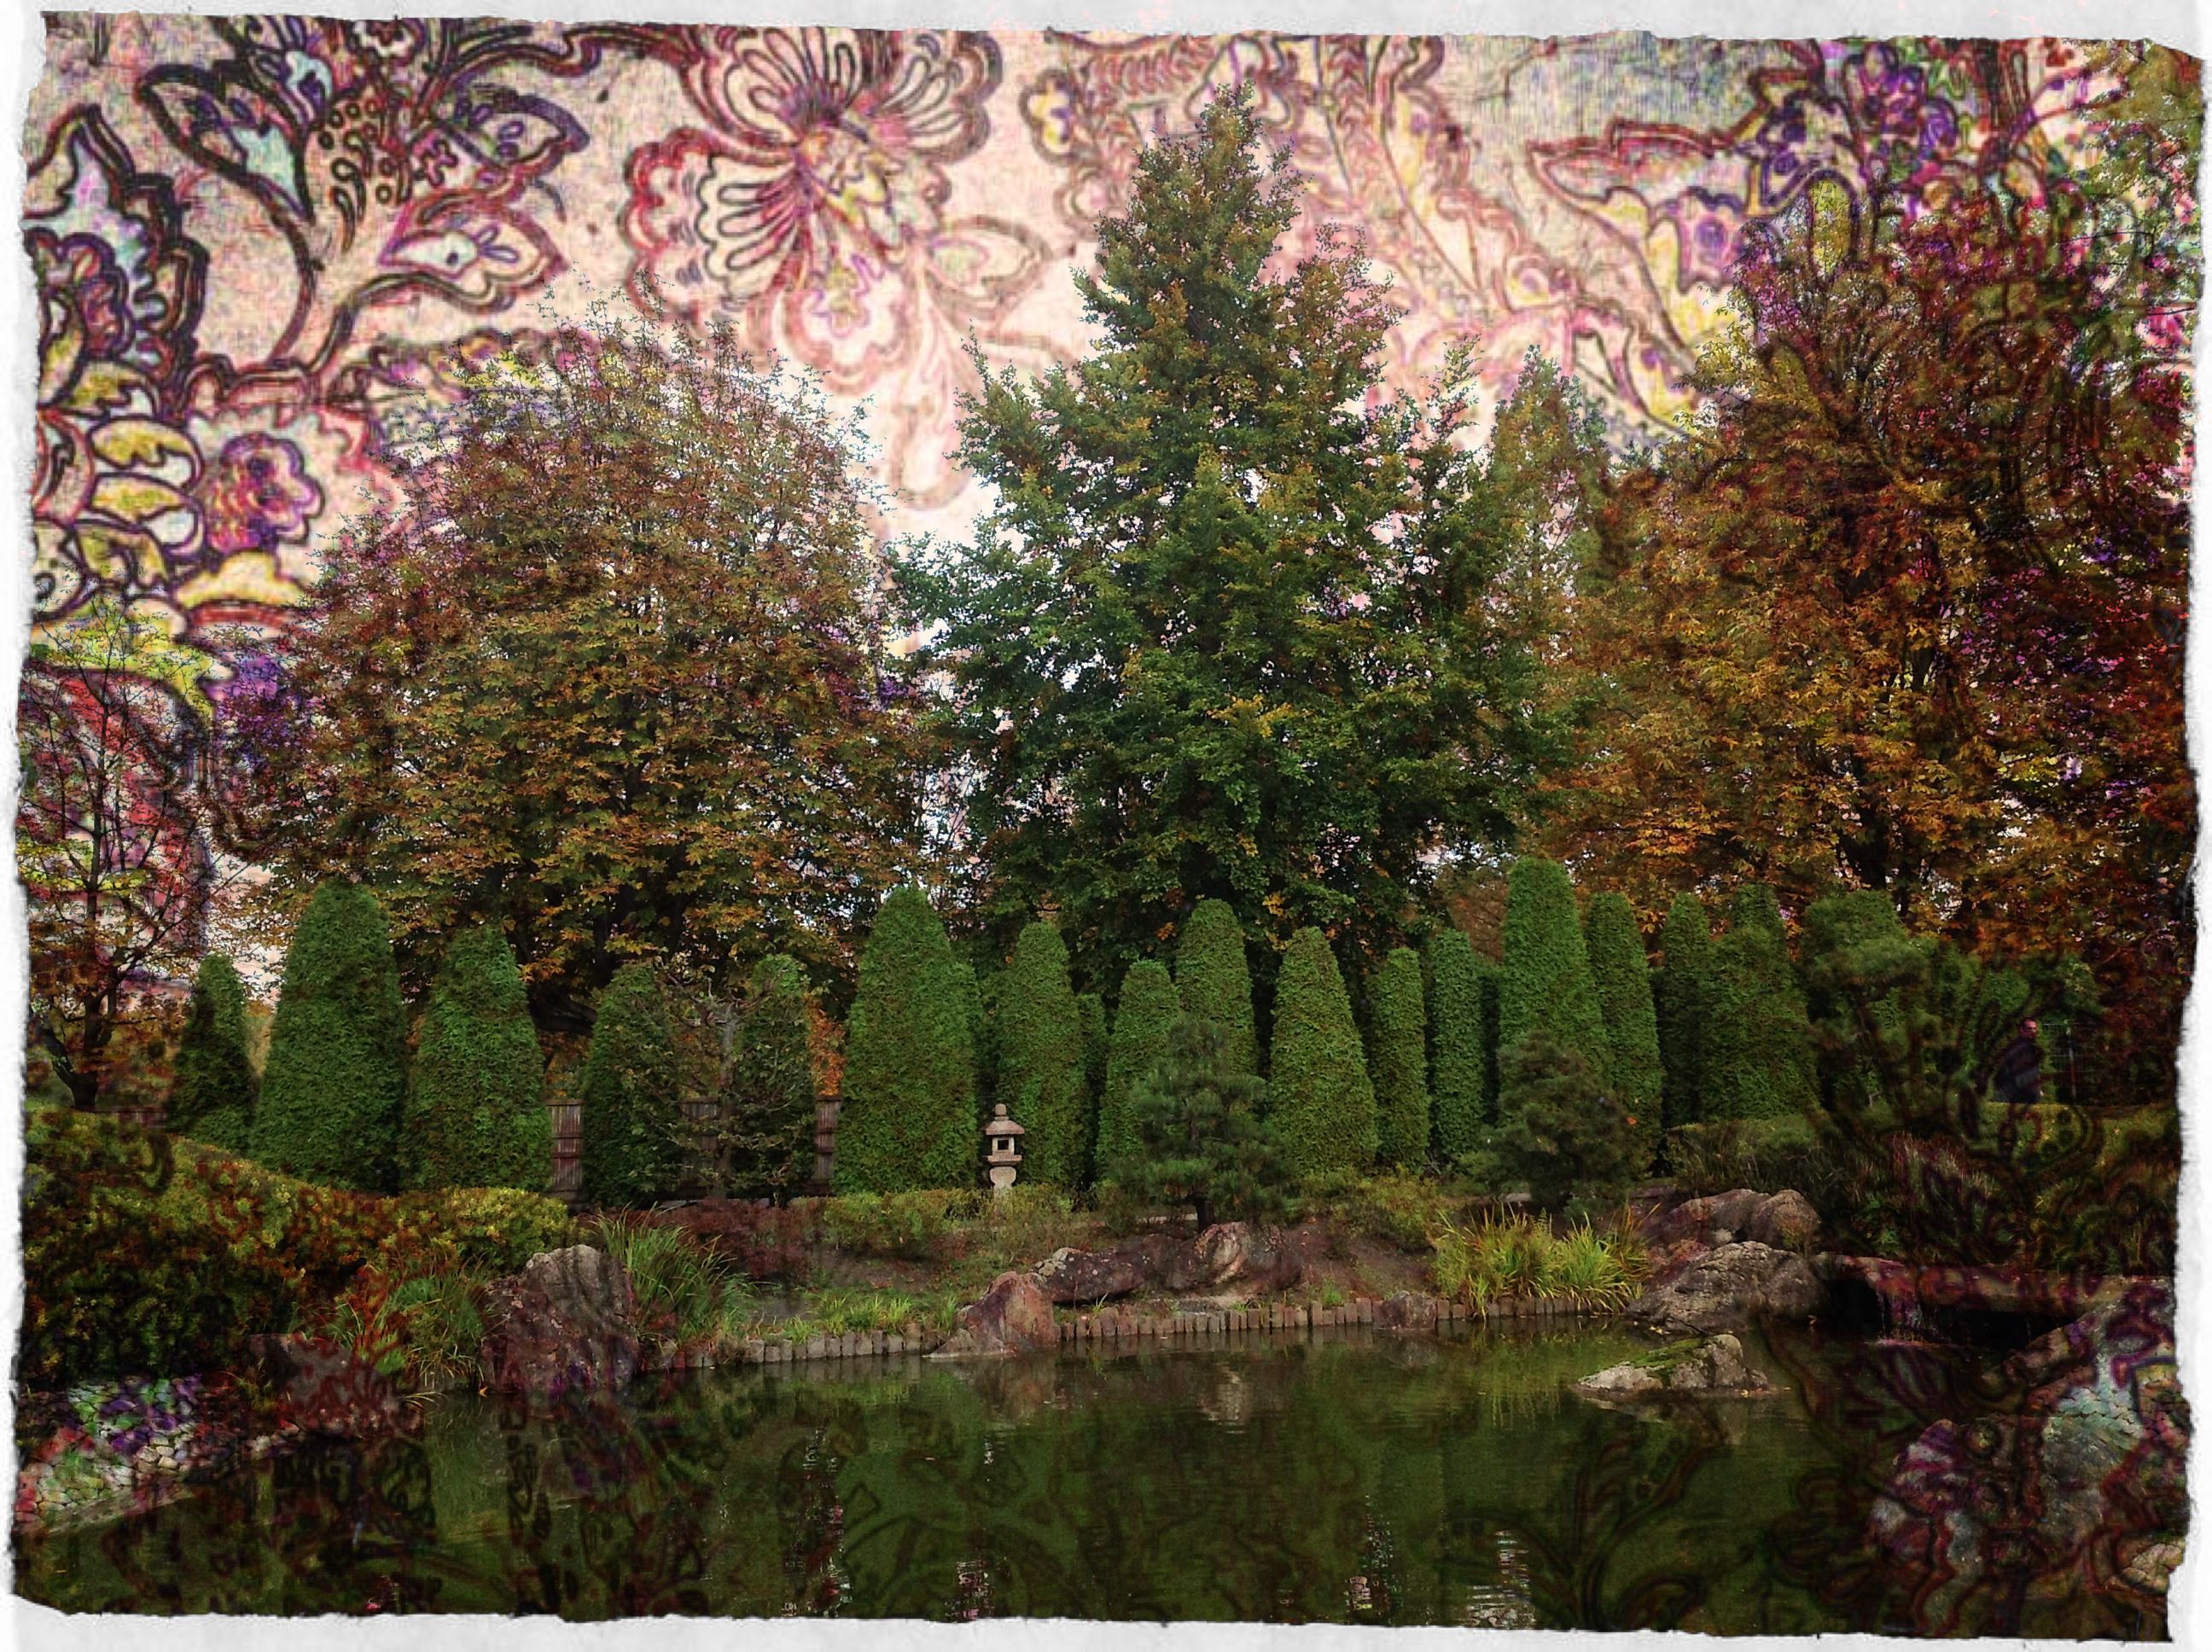 bnjapanischergarten_web.jpg